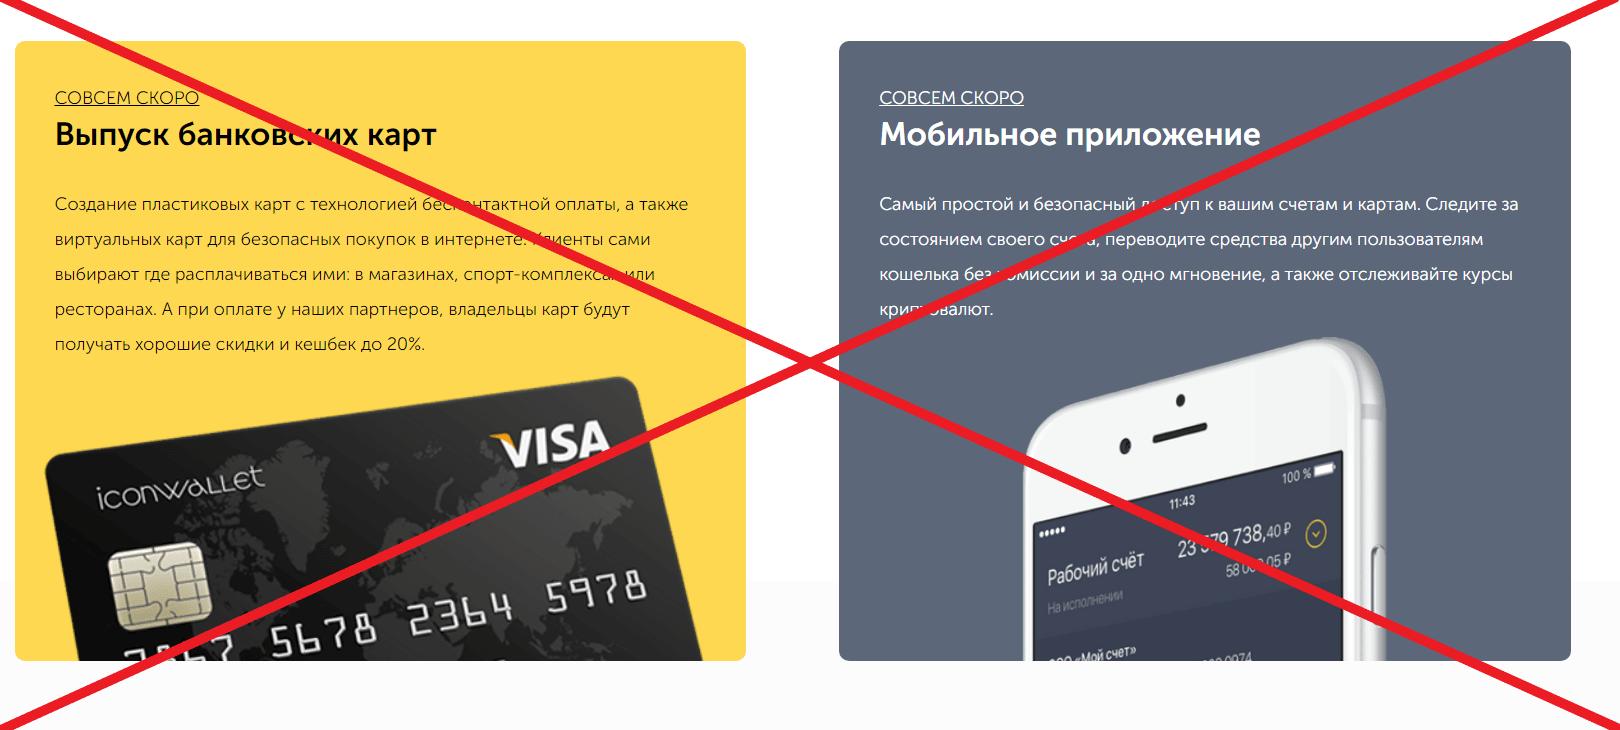 Icon Wallet - реальные отзывы о iwallet.global